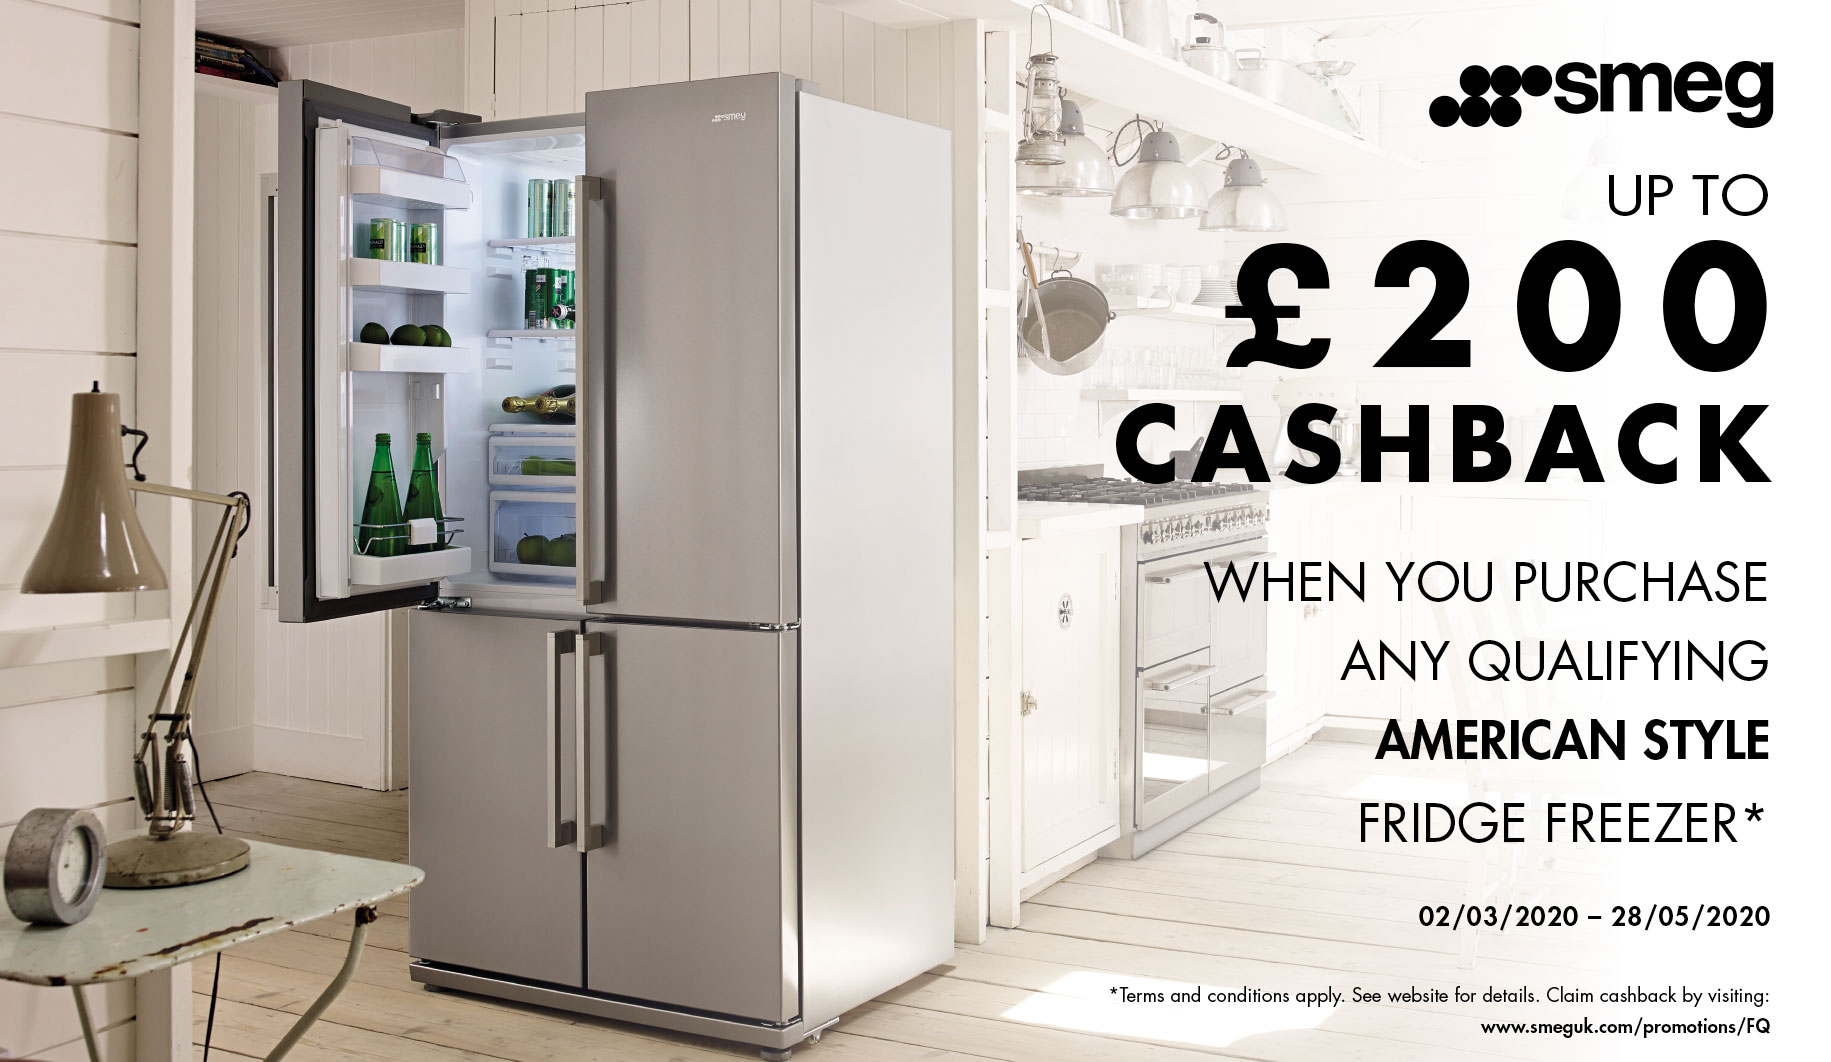 Smeg 2020 Refrigeration Cashback